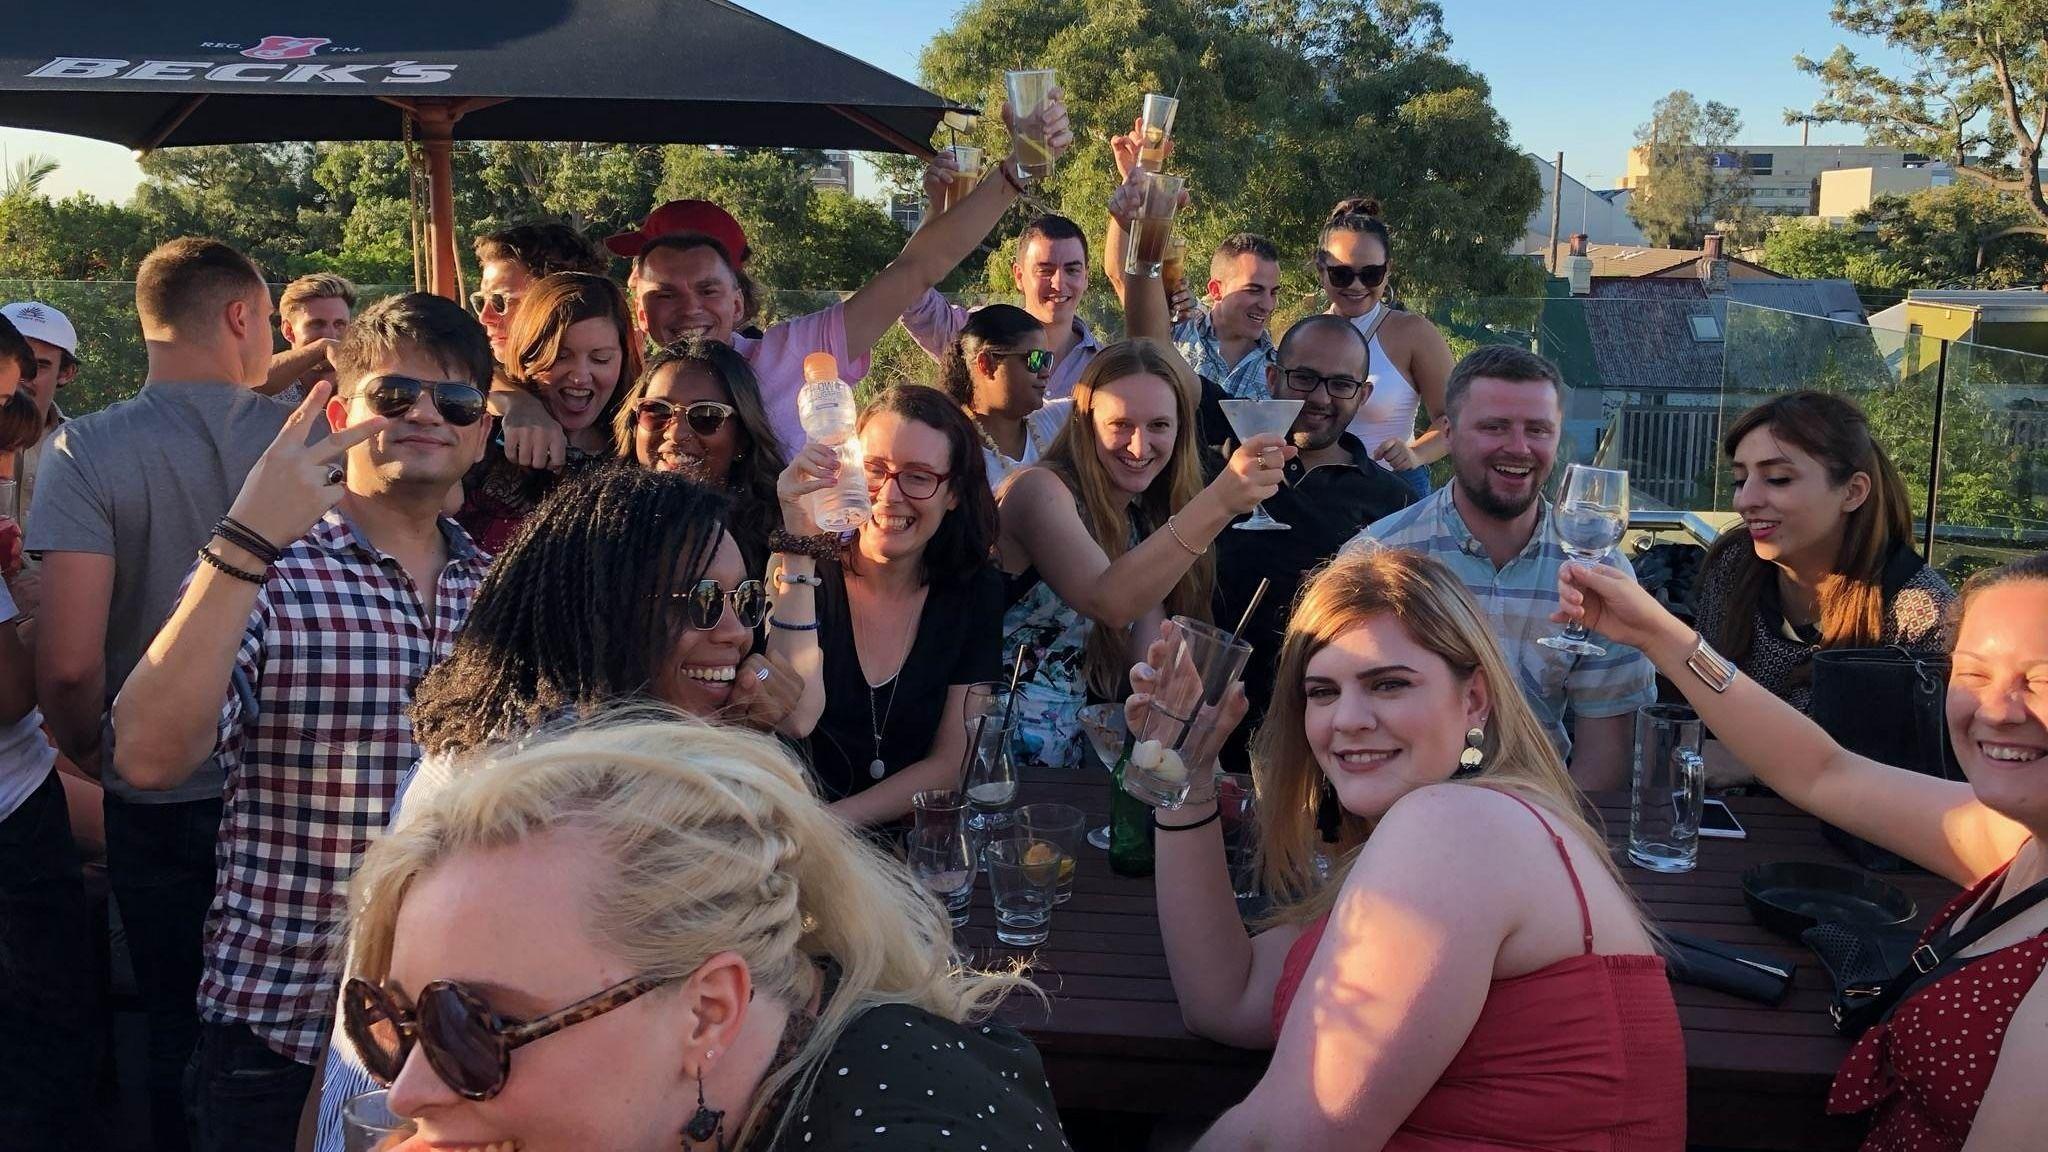 Sydney's Spectacular Social Scene